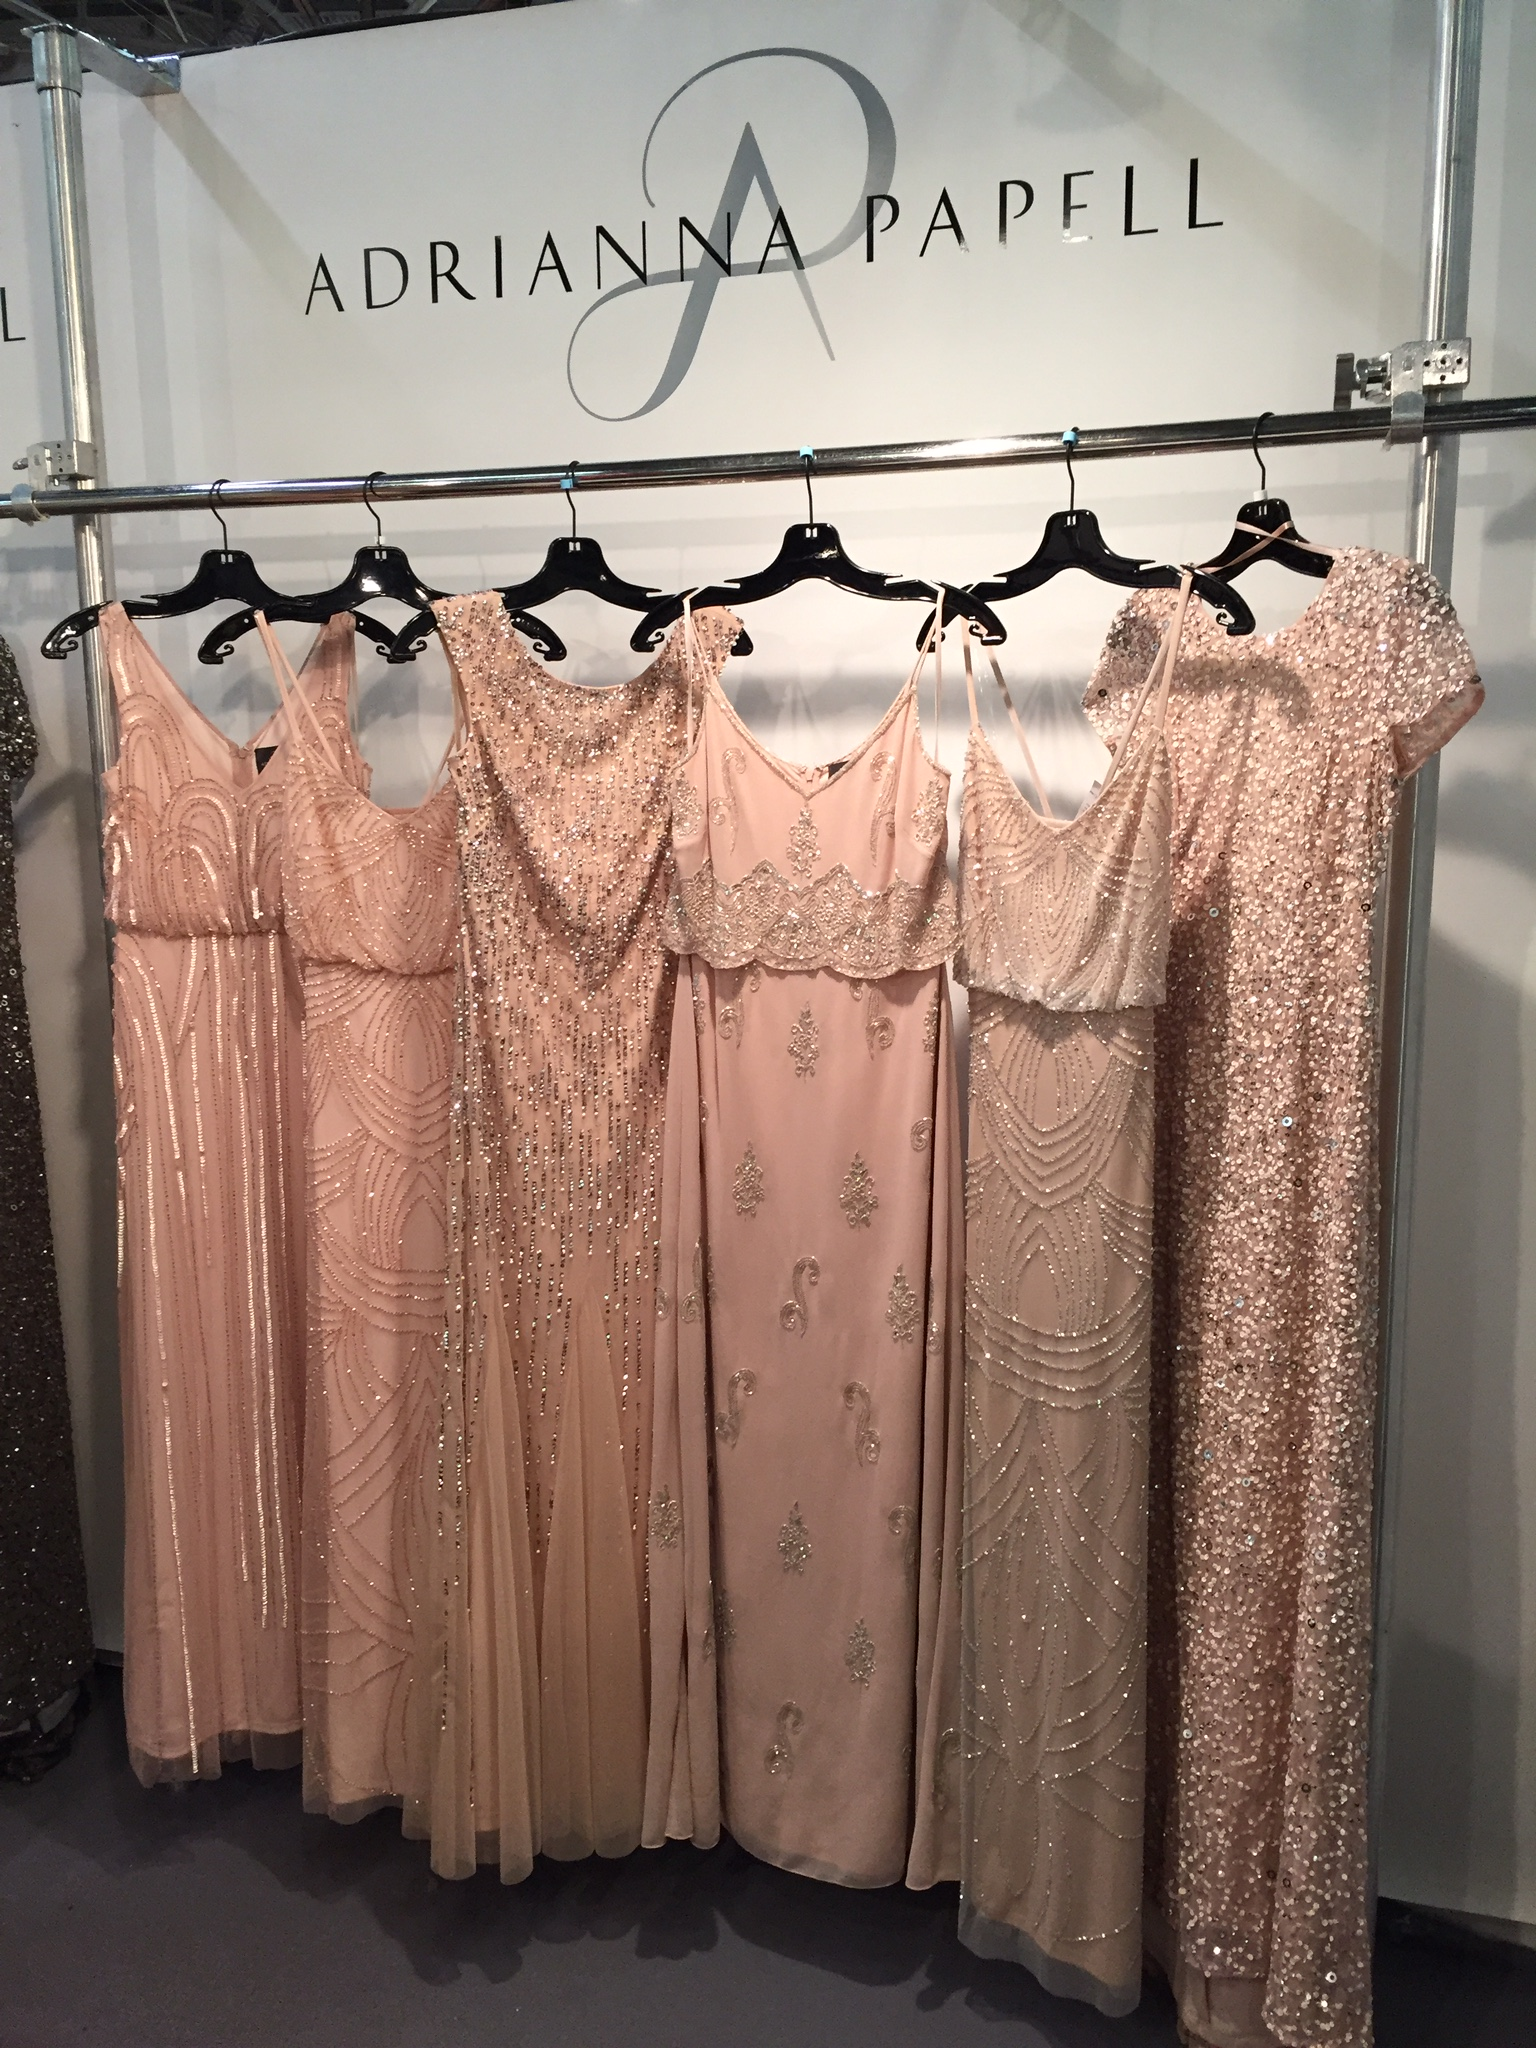 Adrianna Papell Varied Blush beaded dresses